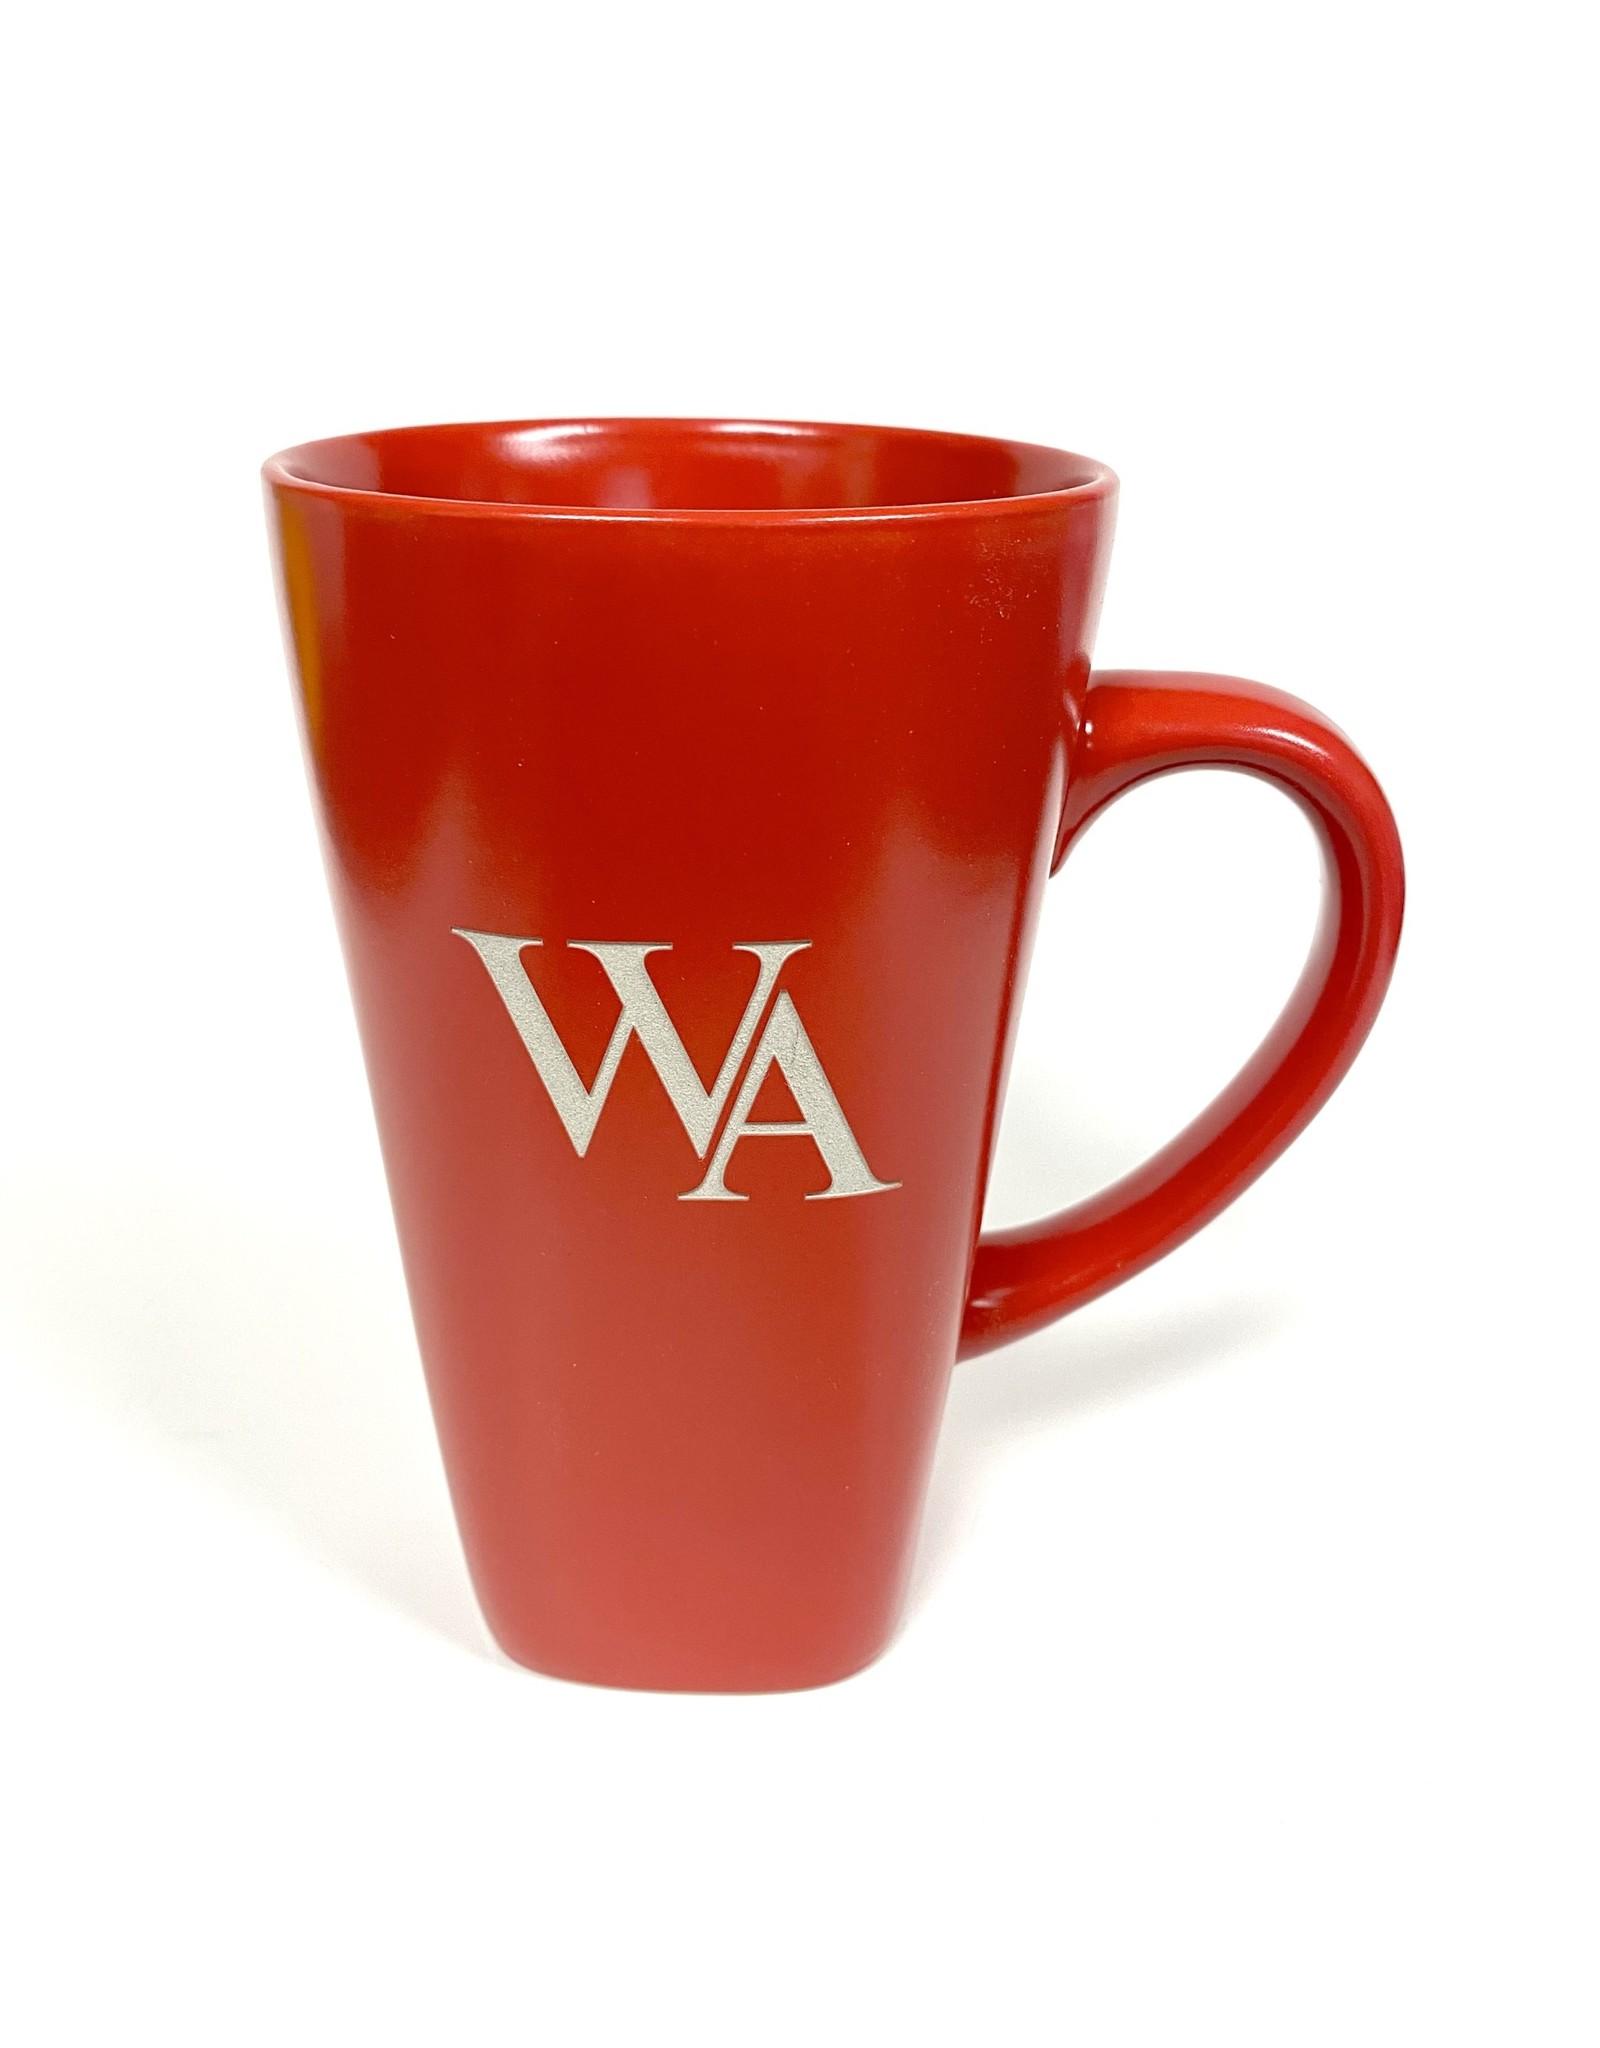 LXG MUG WA Tall Cafe Ceramic Mug